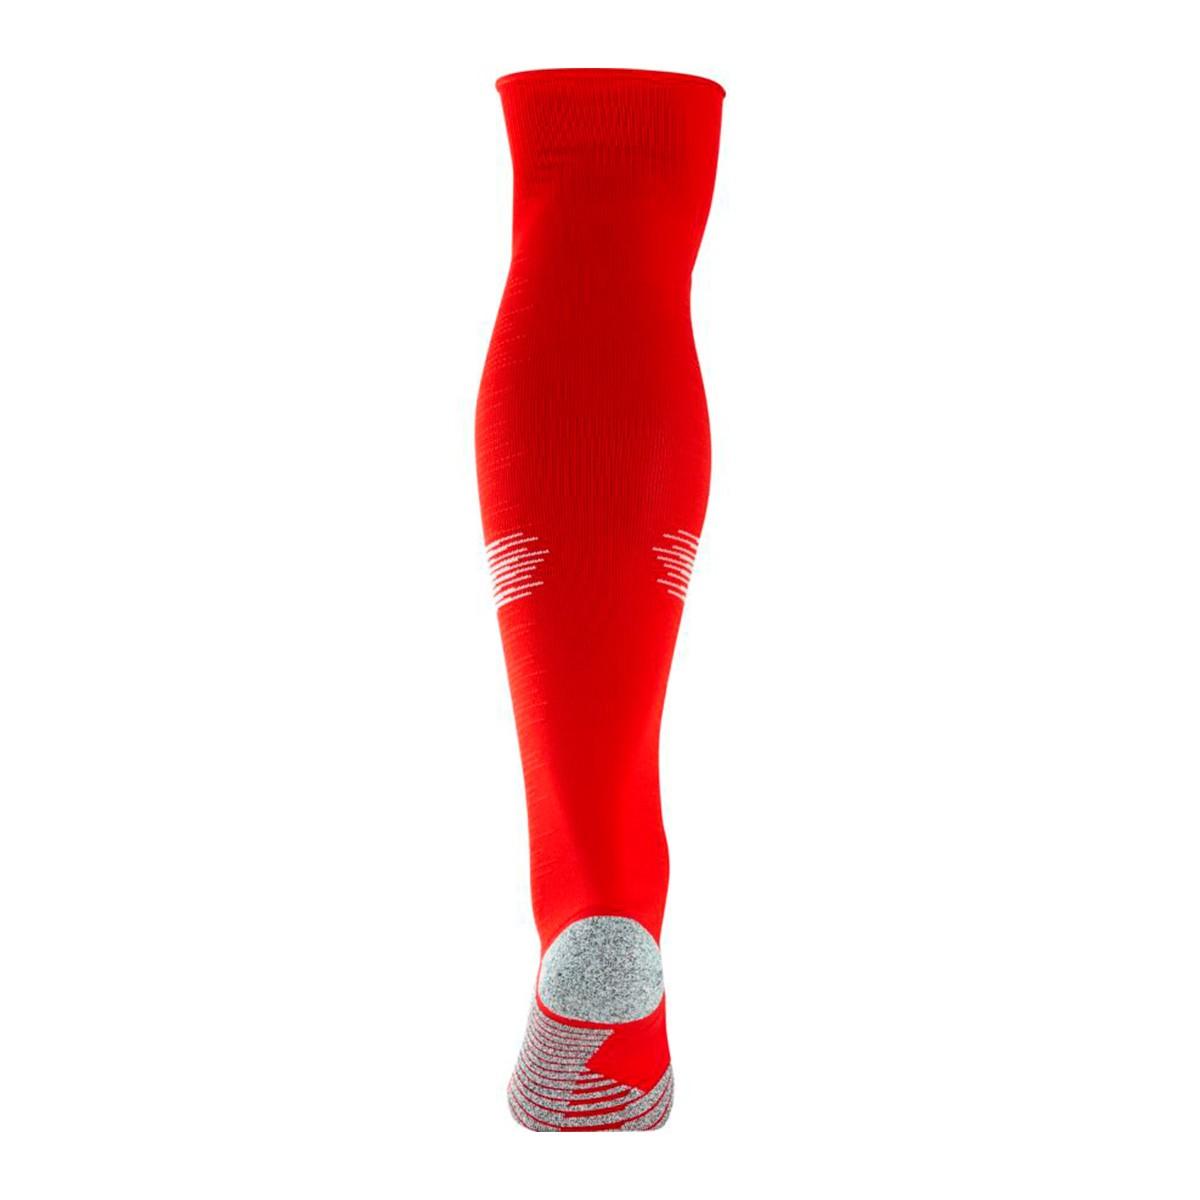 fb25d7d3 Football Socks Nike NikeGrip Strike Light University red-White - Football  store Fútbol Emotion